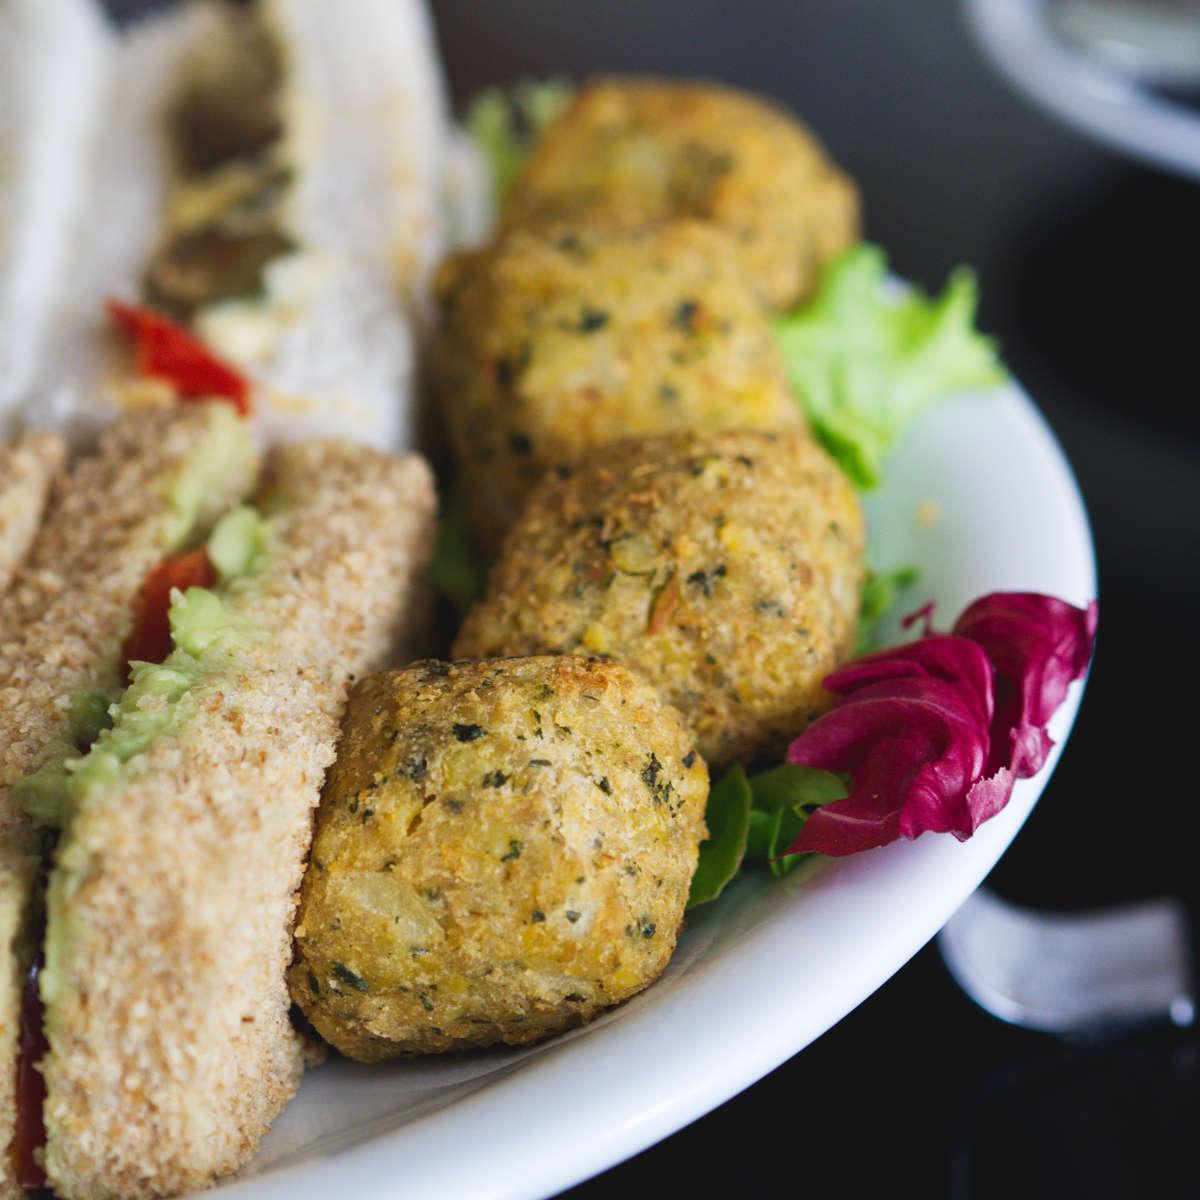 Vegan falafel at Mimi's Bakehouse, Edinburgh